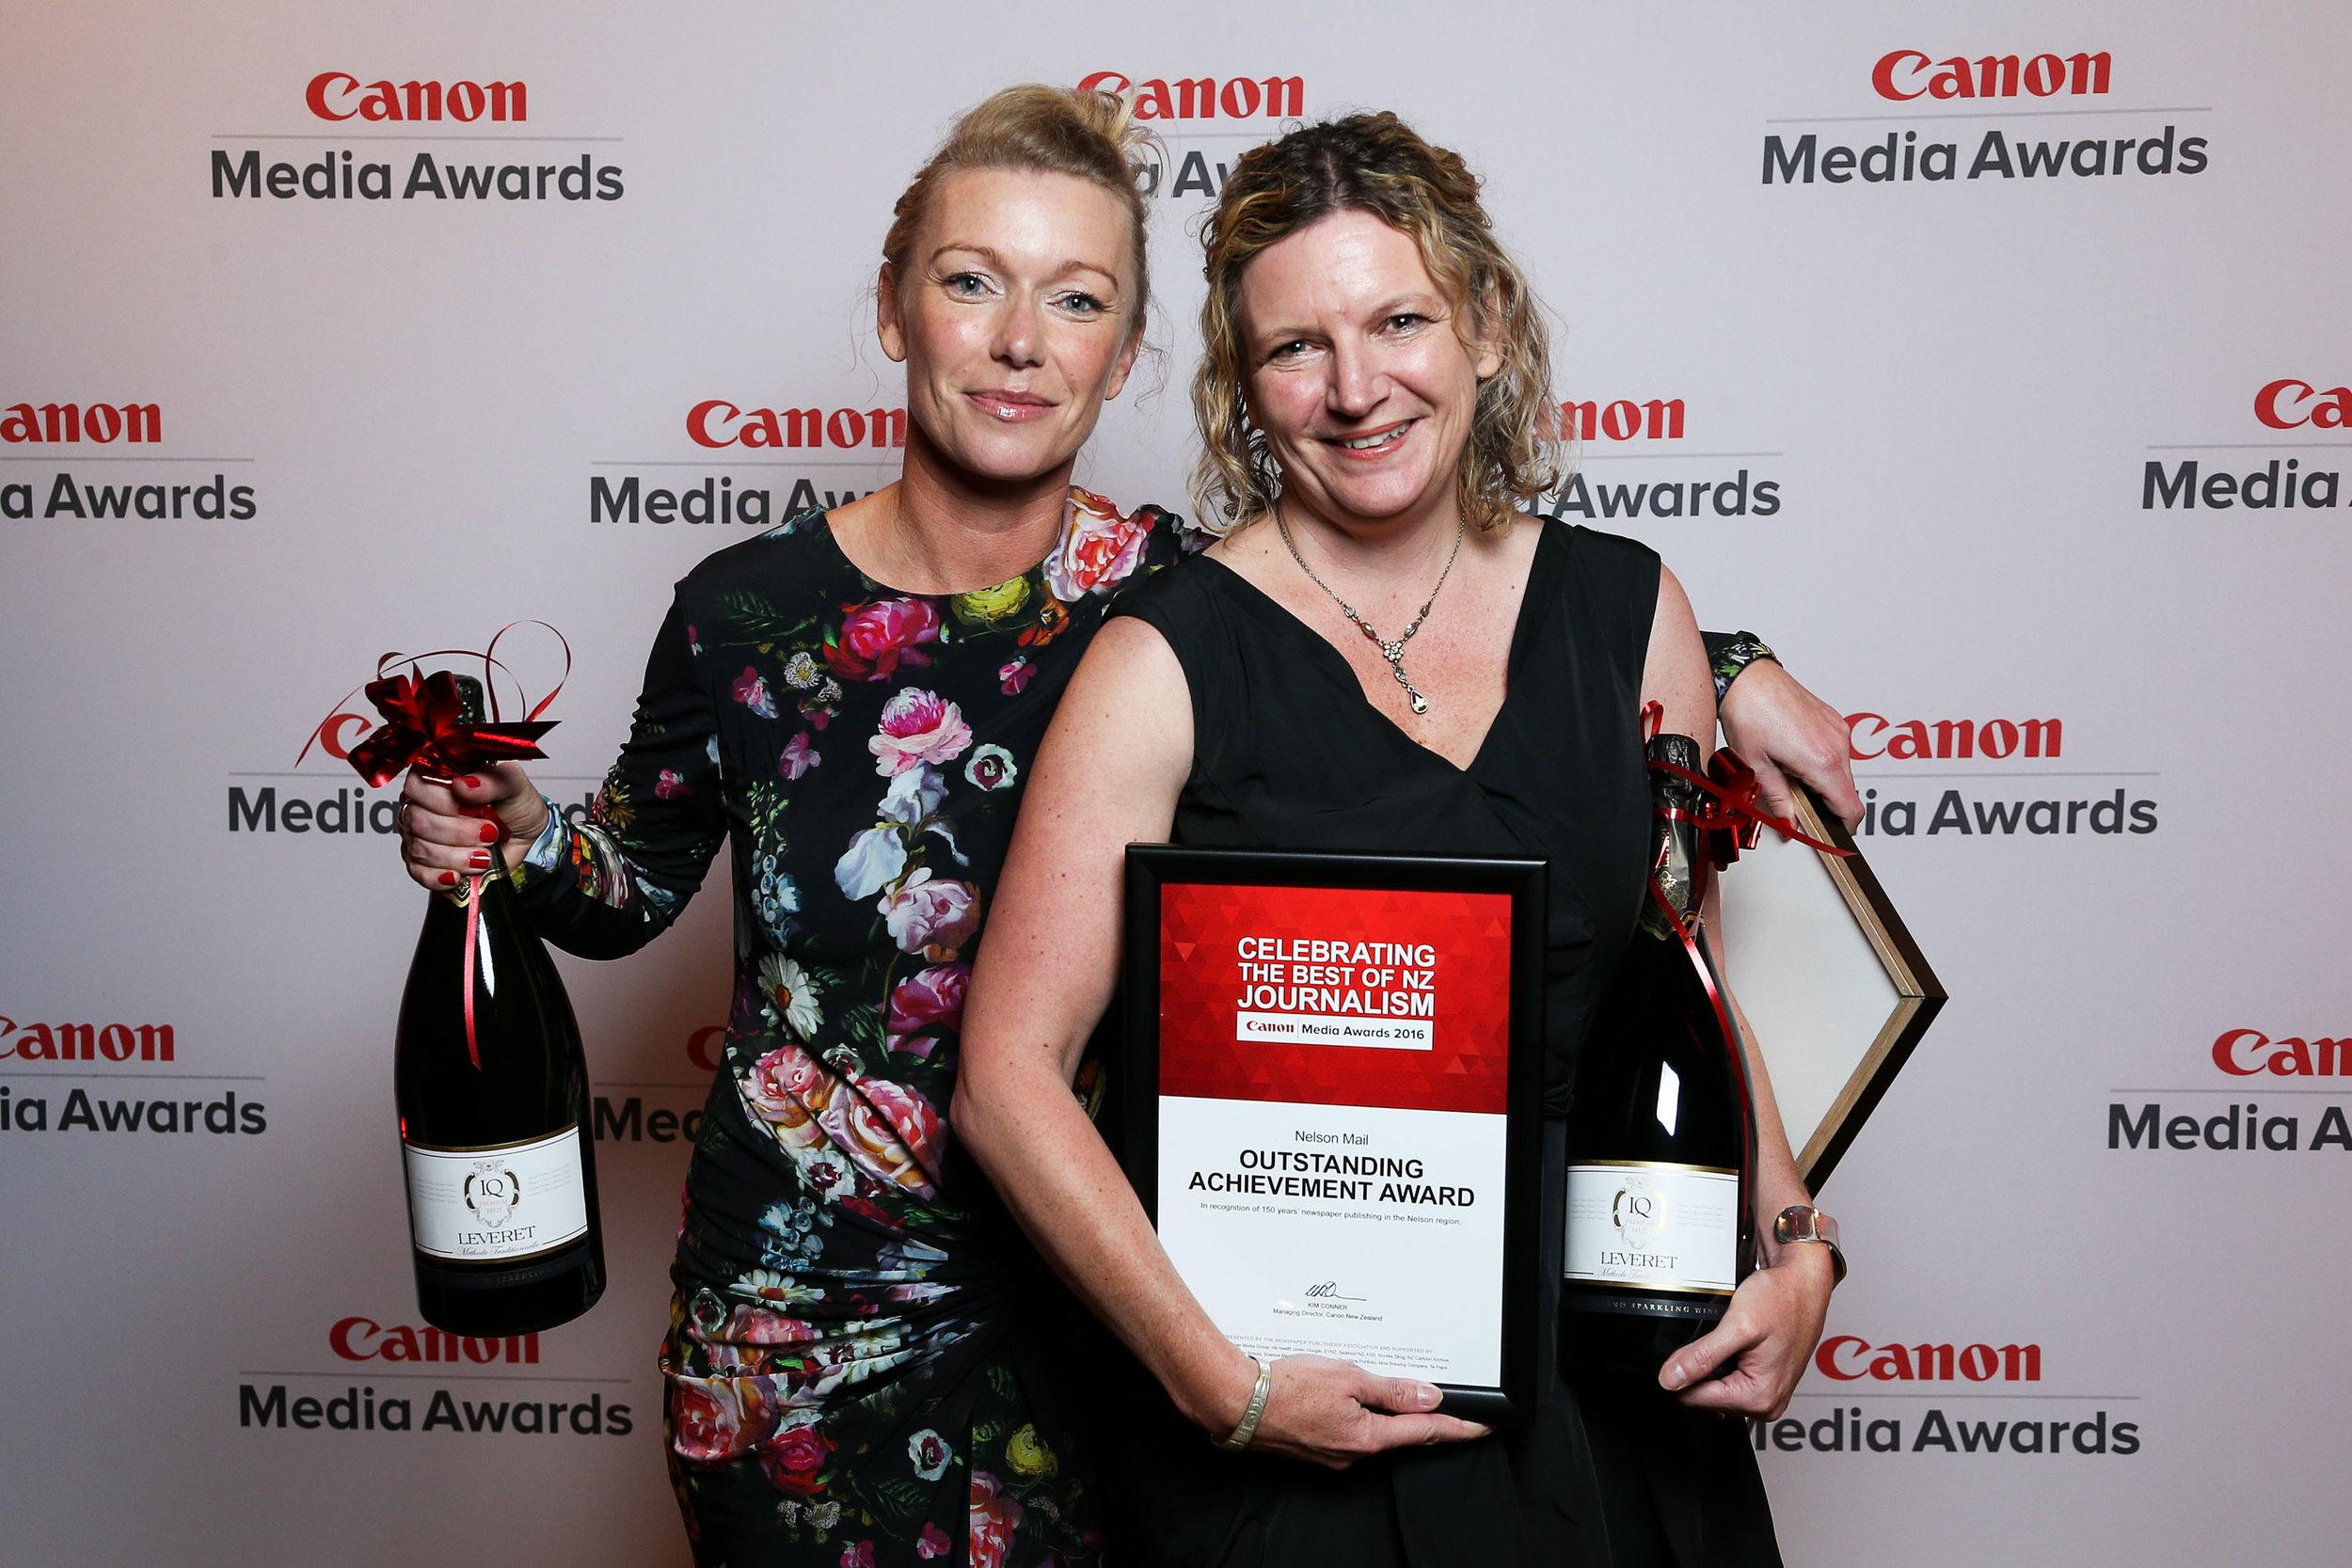 160520_Canon_Media_Awards_17.JPG